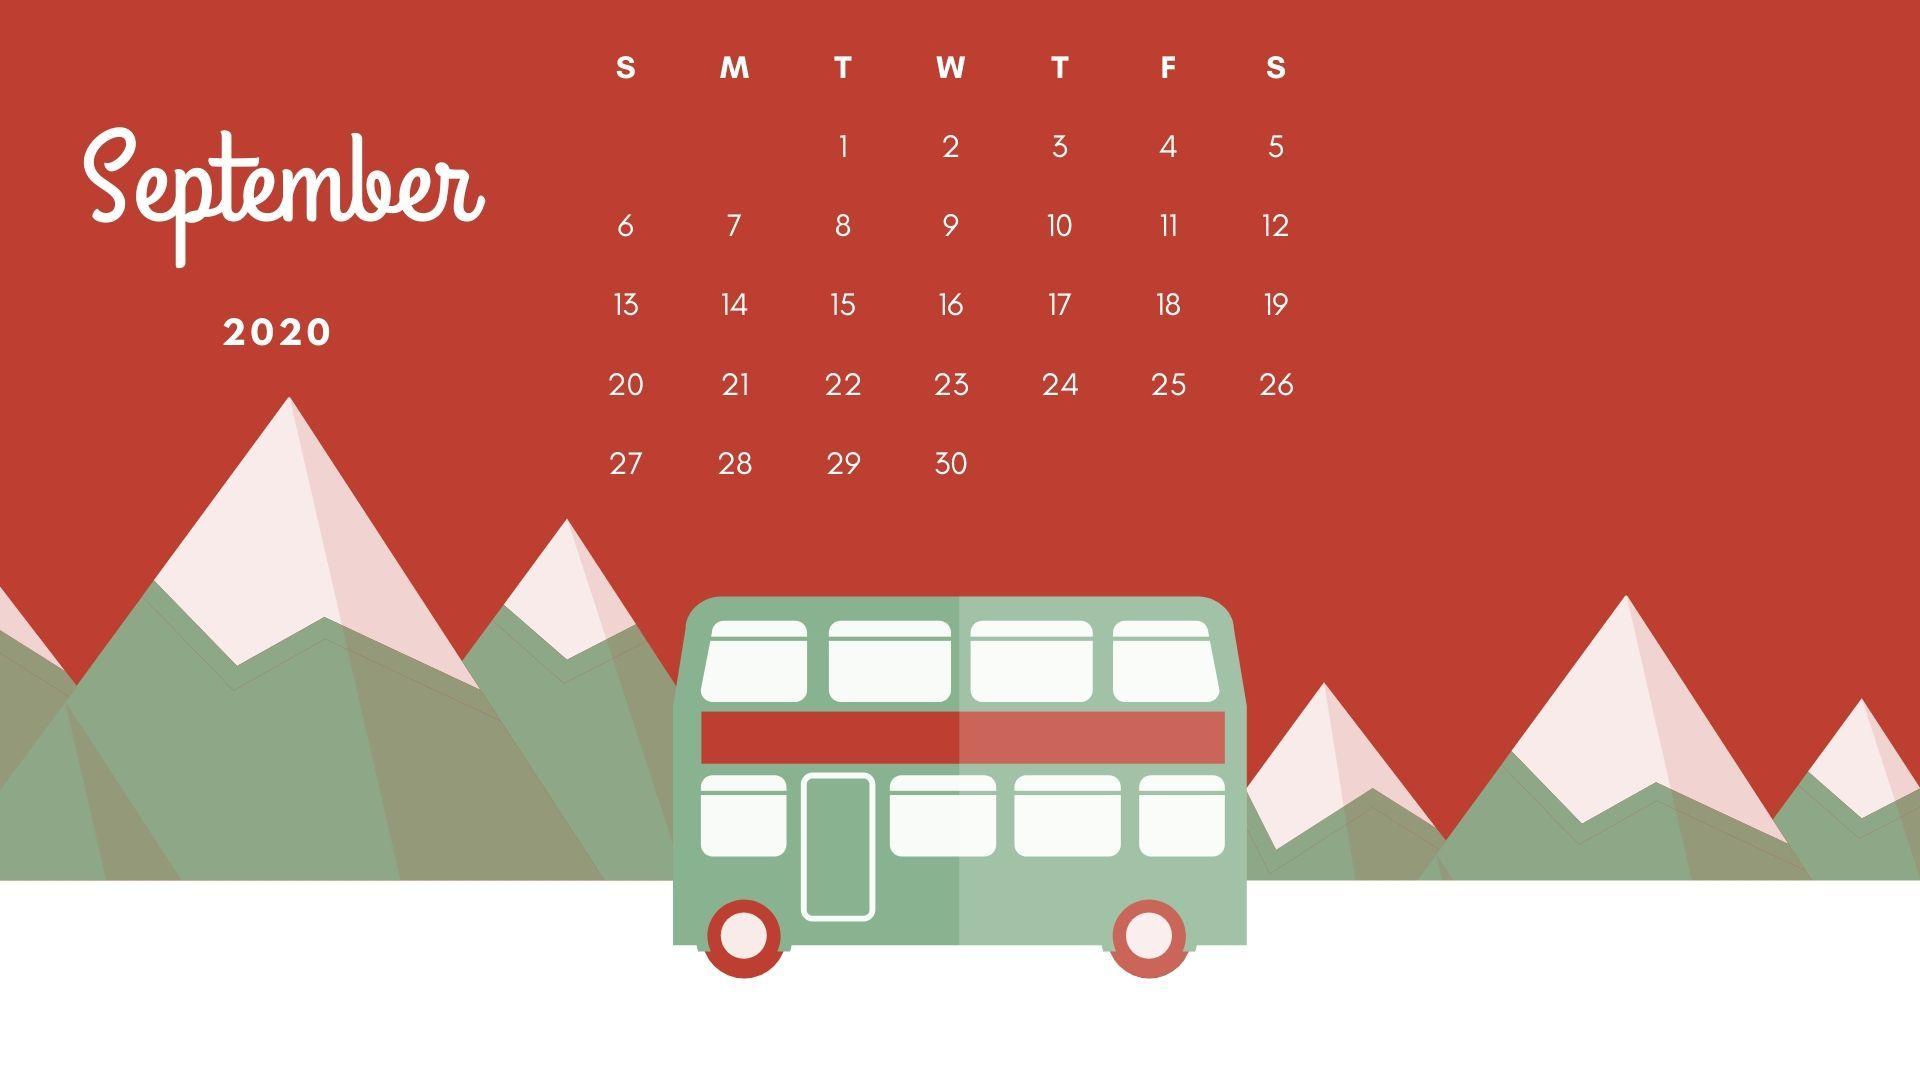 Free September 2020 High Definition Calendar Wallpaper Download For Pc In 2020 Calendar Wallpaper September Calendar Calendar